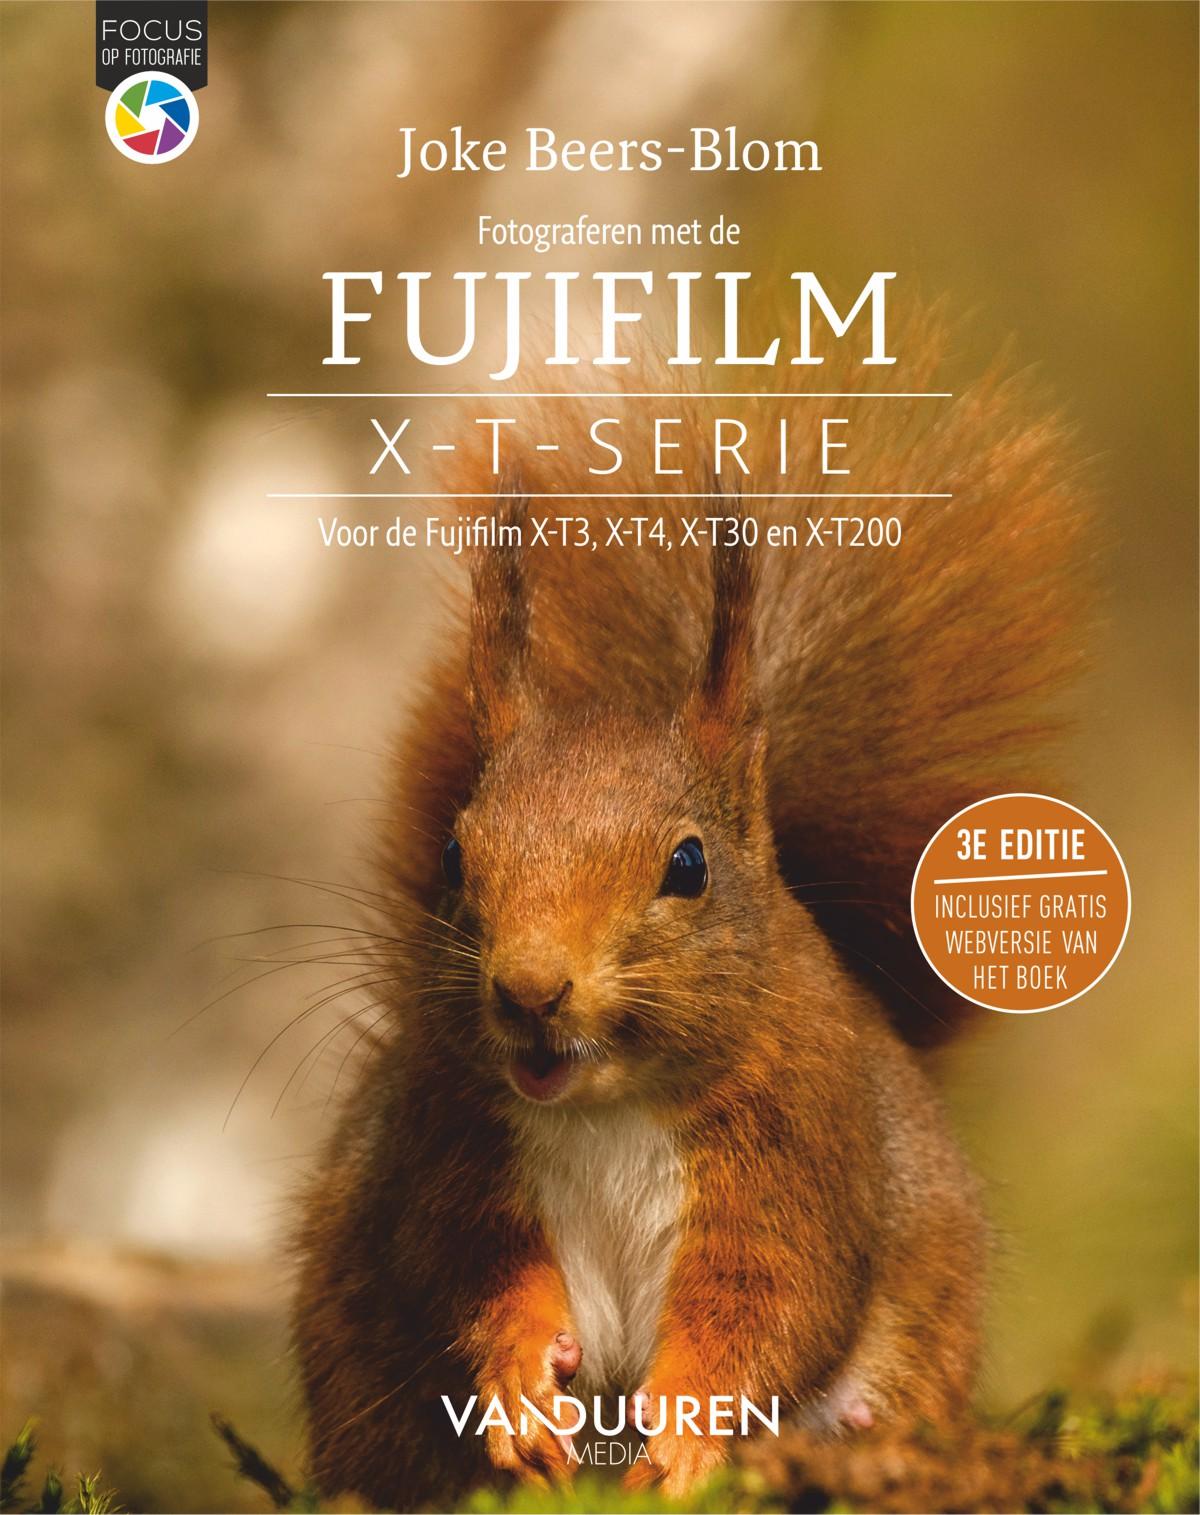 Fotograferen met de Fujifilm X-T-serie, 3e editie. Voor de de X-T3, X-T4, X-T30 en X-T200 - Joke Beers-Blom, isbn 9789463561518